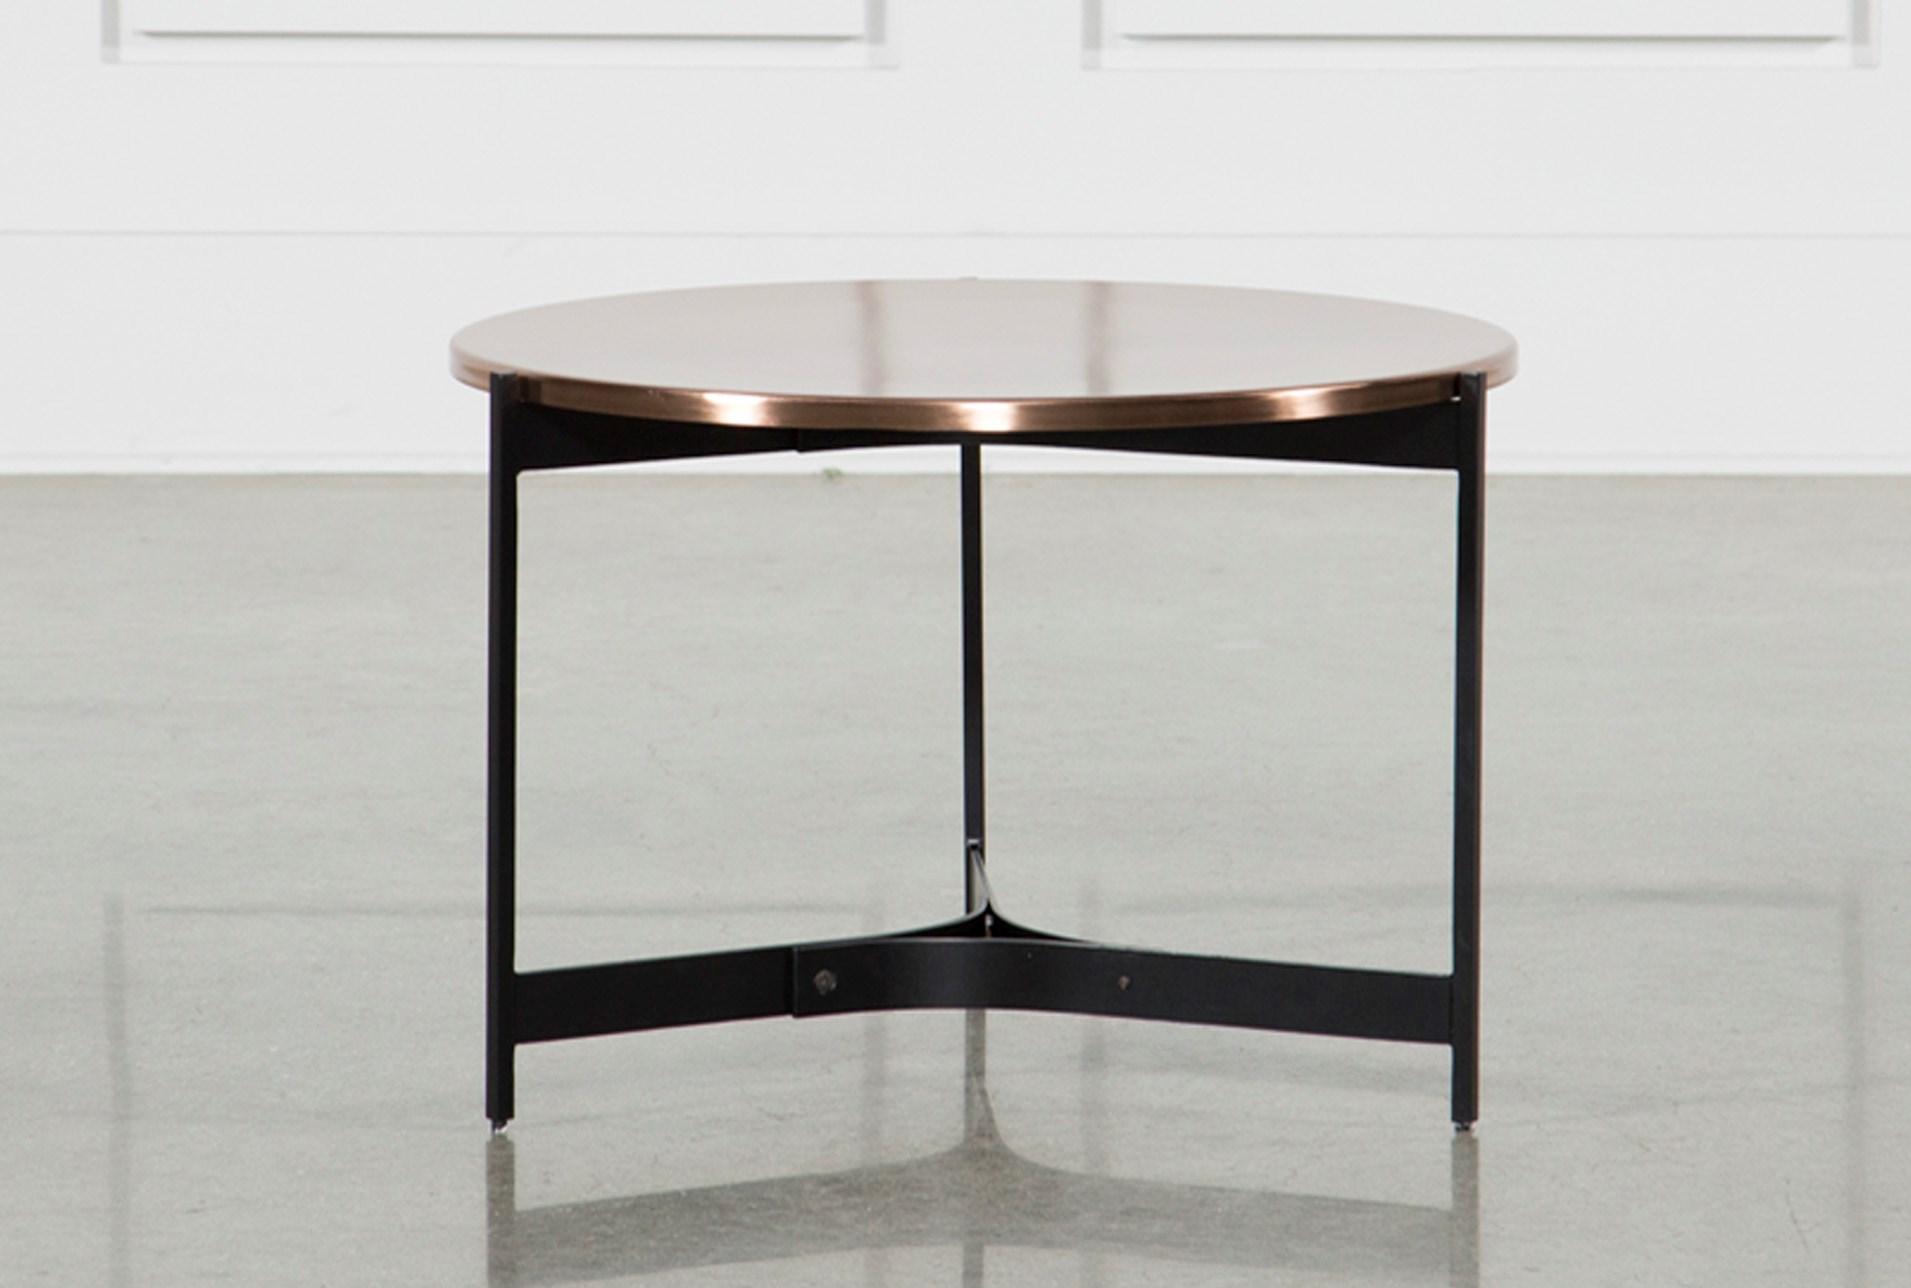 table outdoor market alyssa side world hairpin metal xxx blue product do